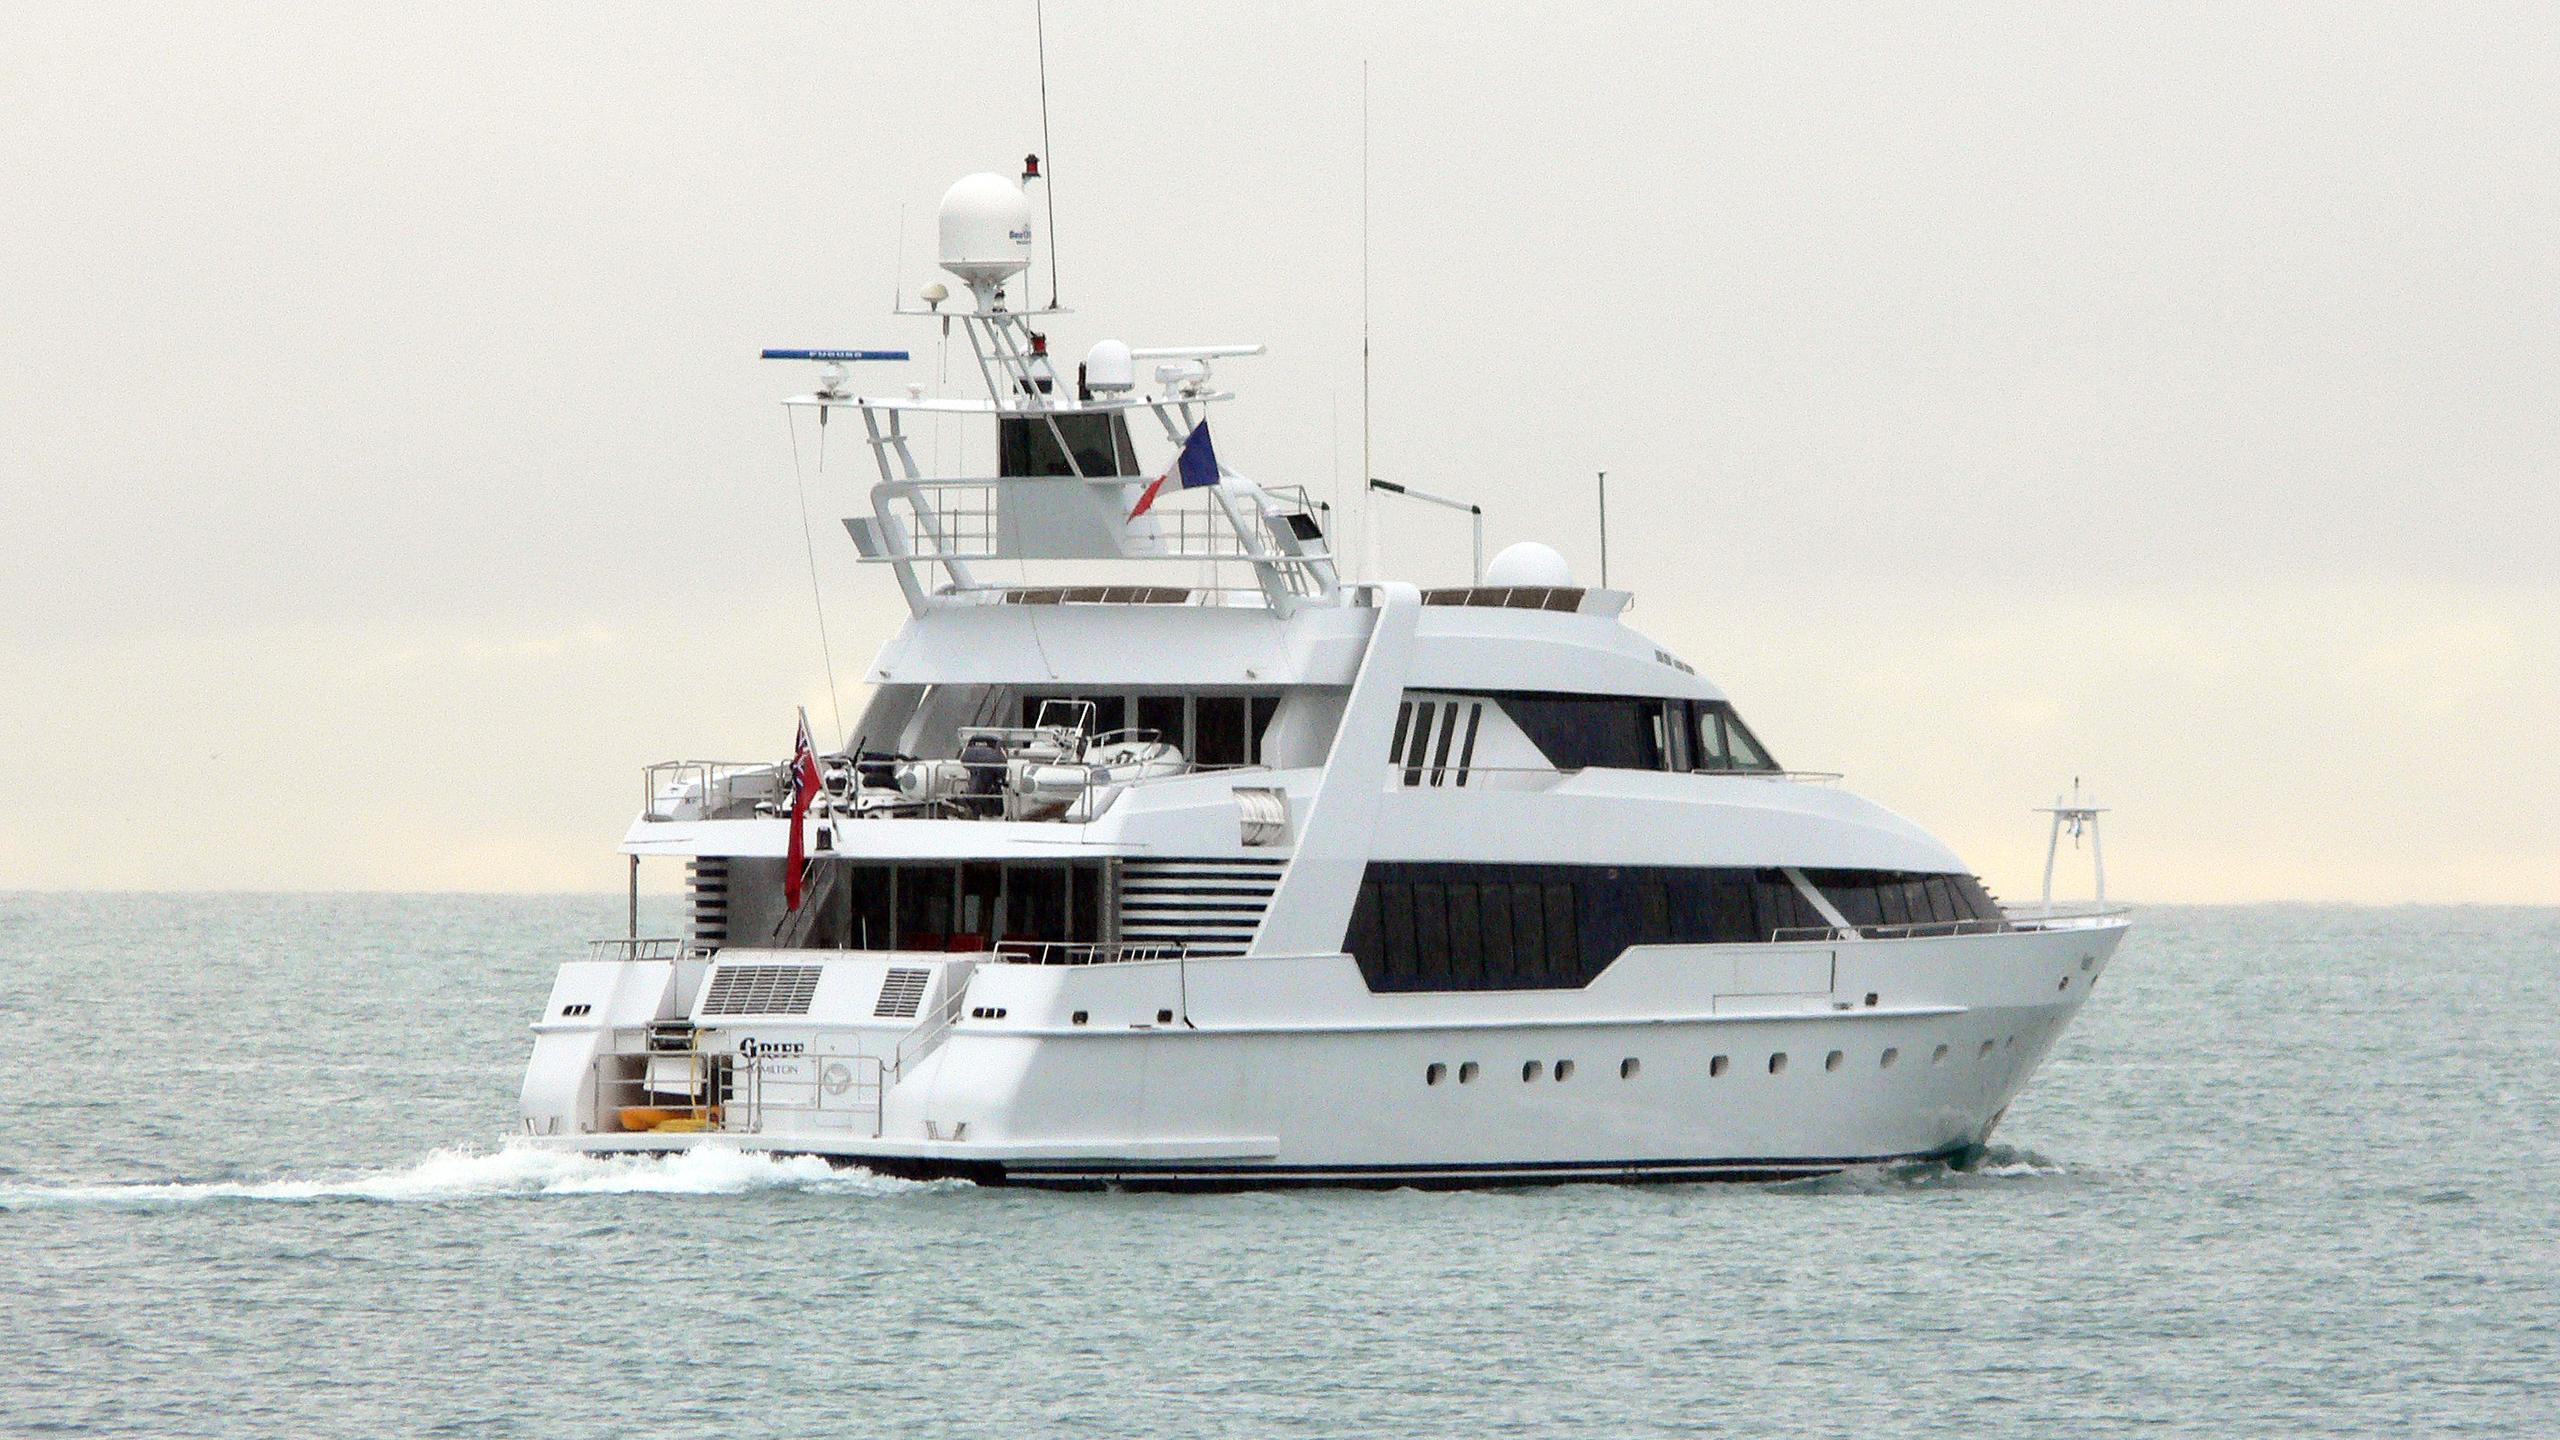 o-leanna-motor-yacht-marinteknik-verkstads-ab-sweden-1994-43m-stern